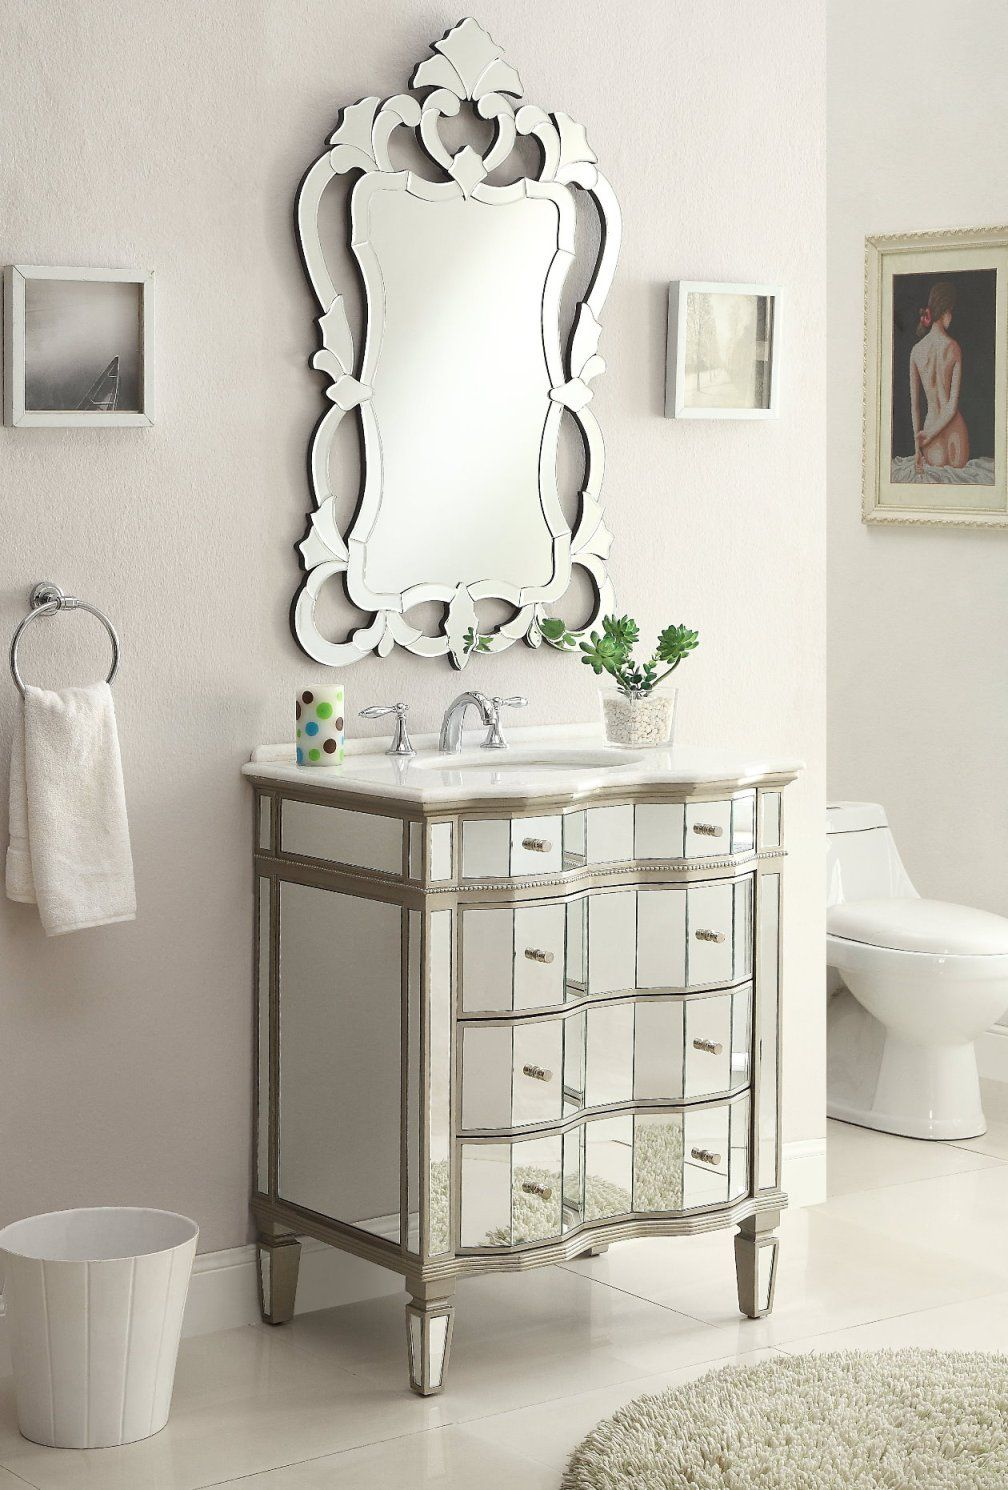 30 inch adelina mirrored bath vanity